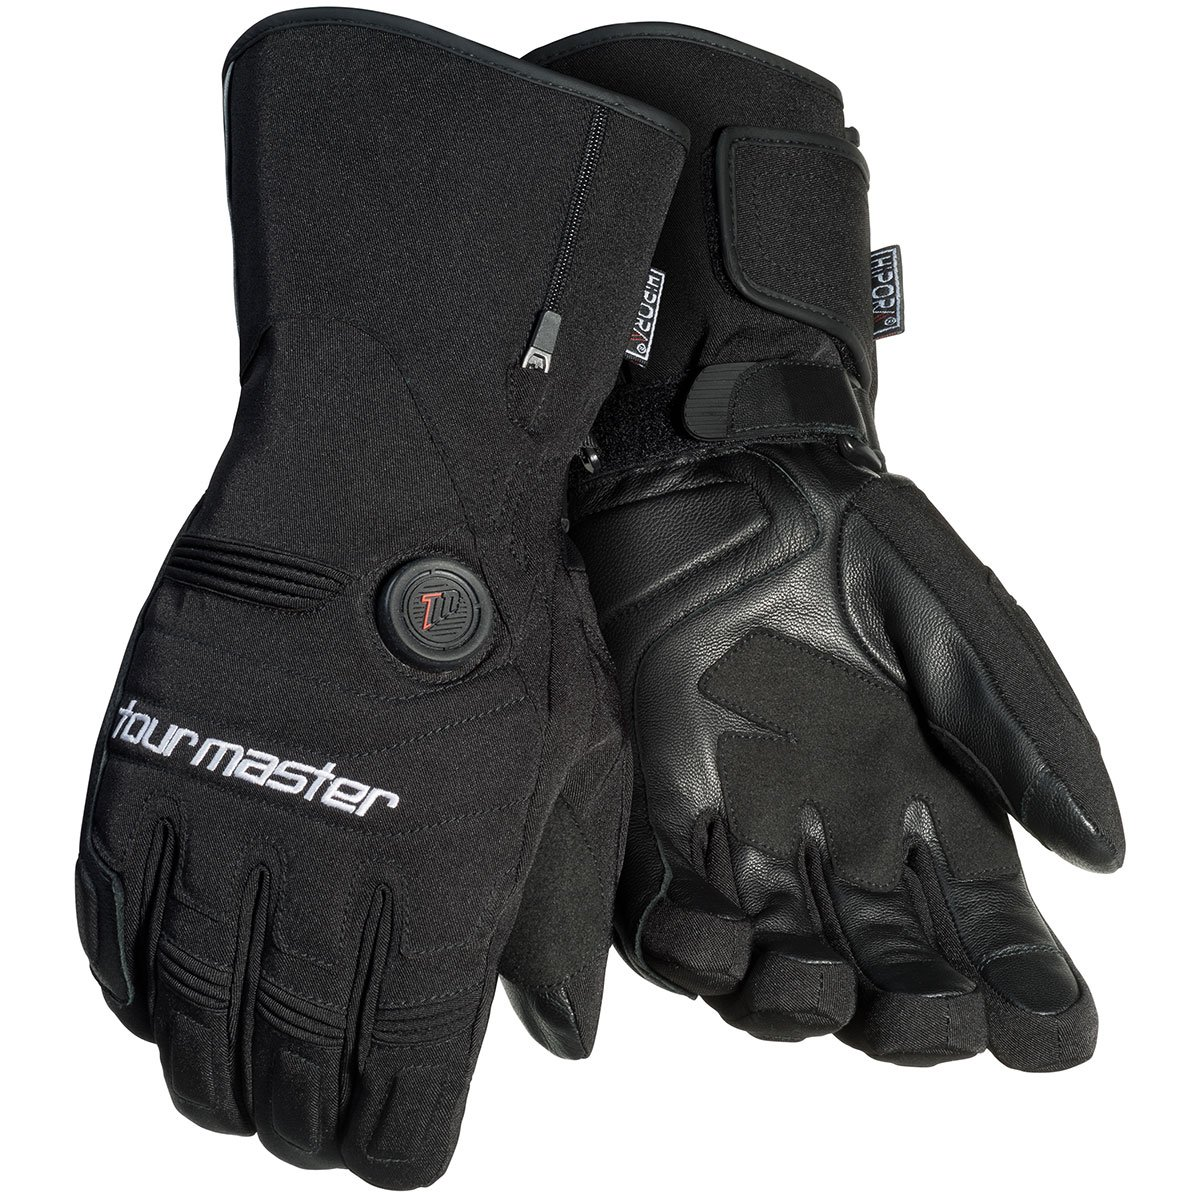 Tourmaster Synergy 7.4V Battery Heated Textile Gloves (XX-LARGE) (BLACK)